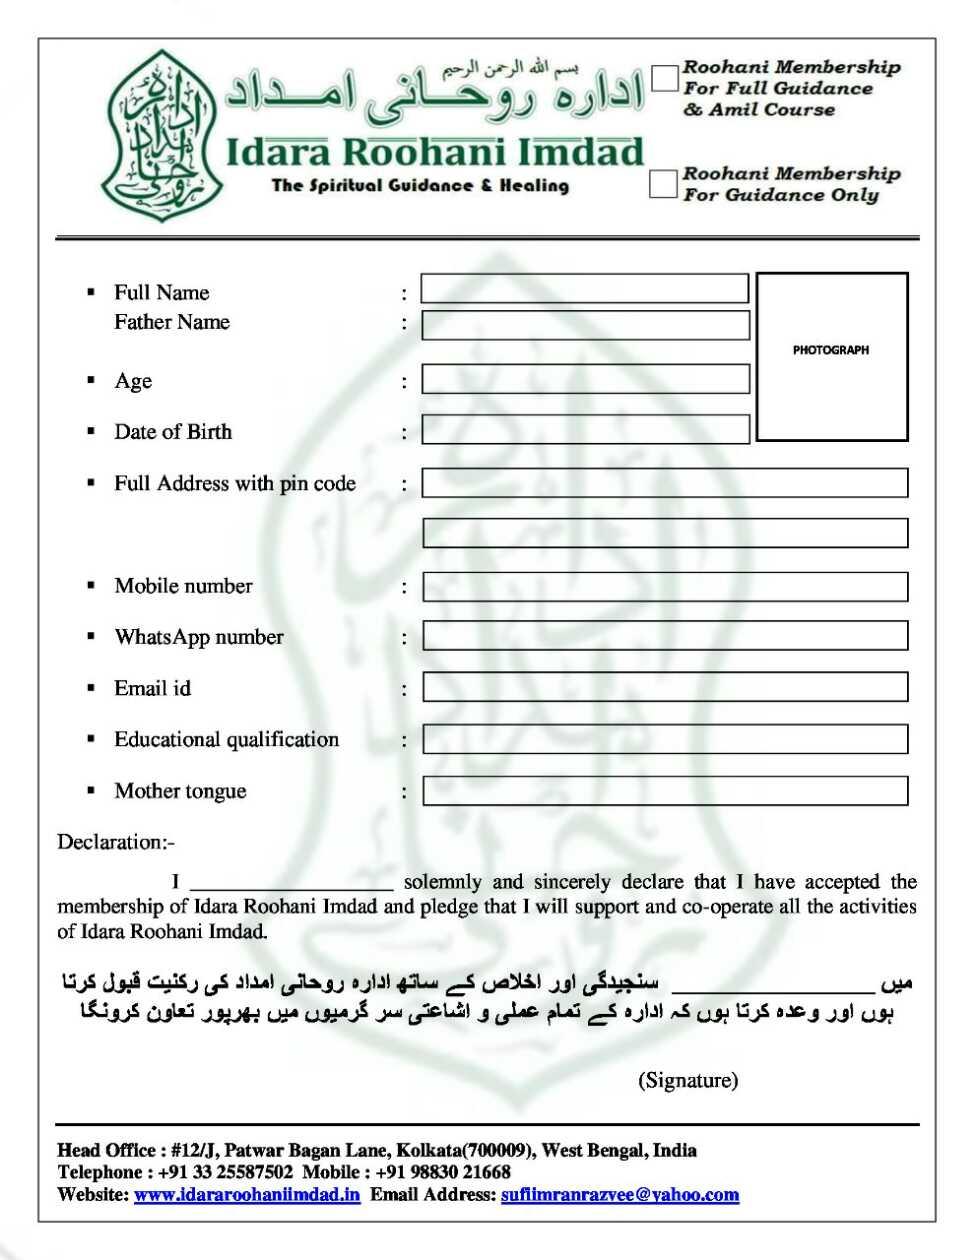 Roohani Membership Form